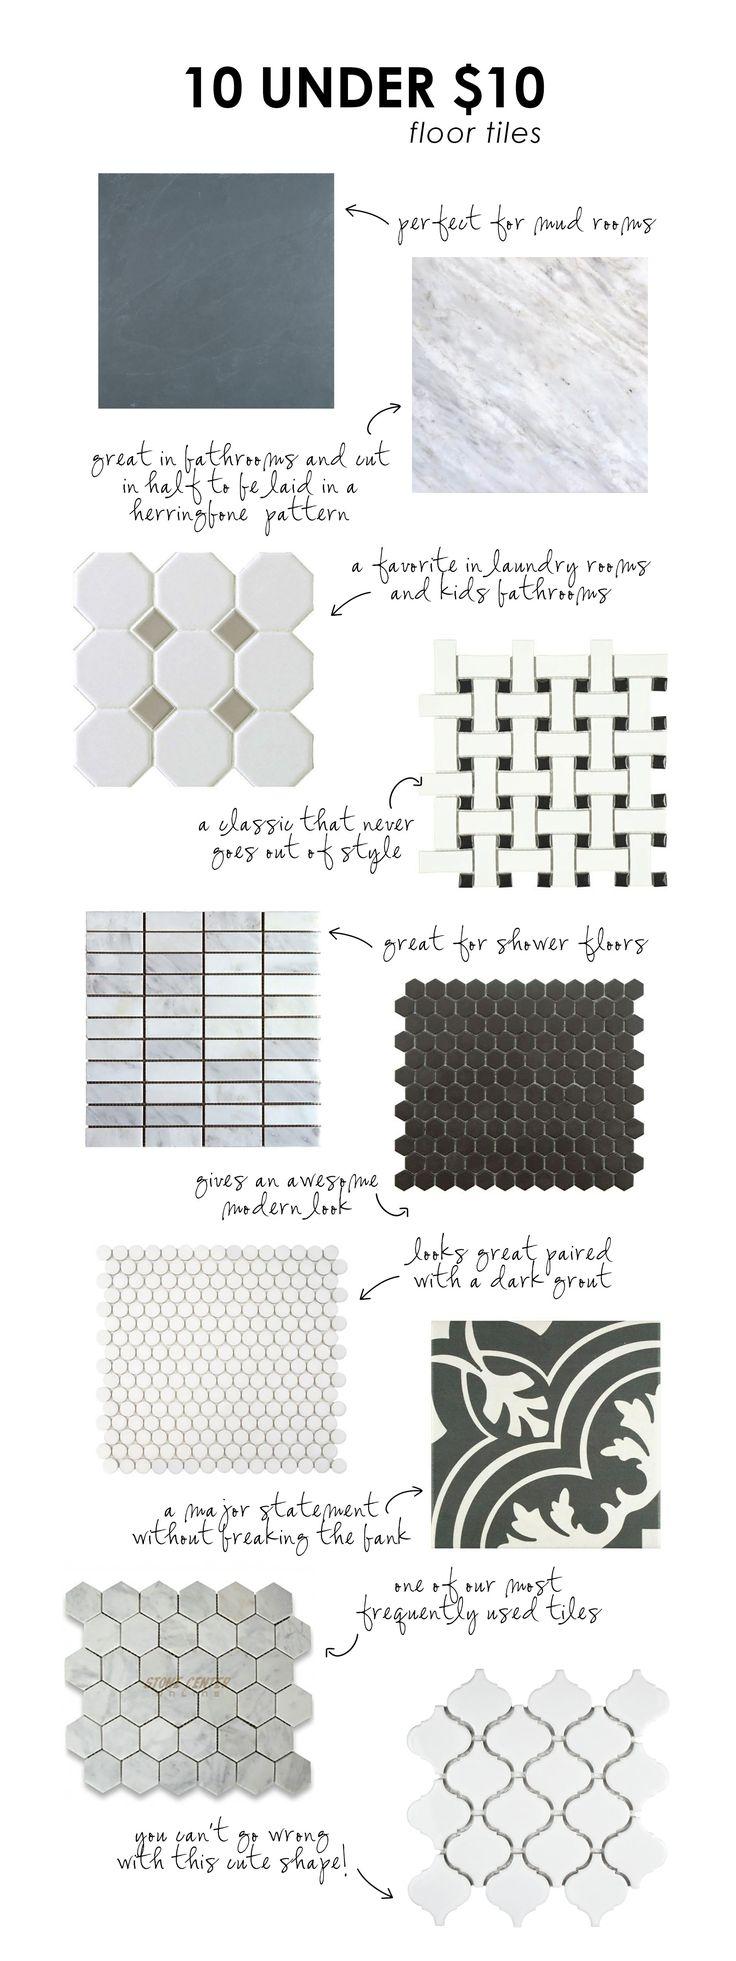 Details about hassam garden painting ceramic bathroom tile murals 2 - 10 Under 10 Tile Flooring